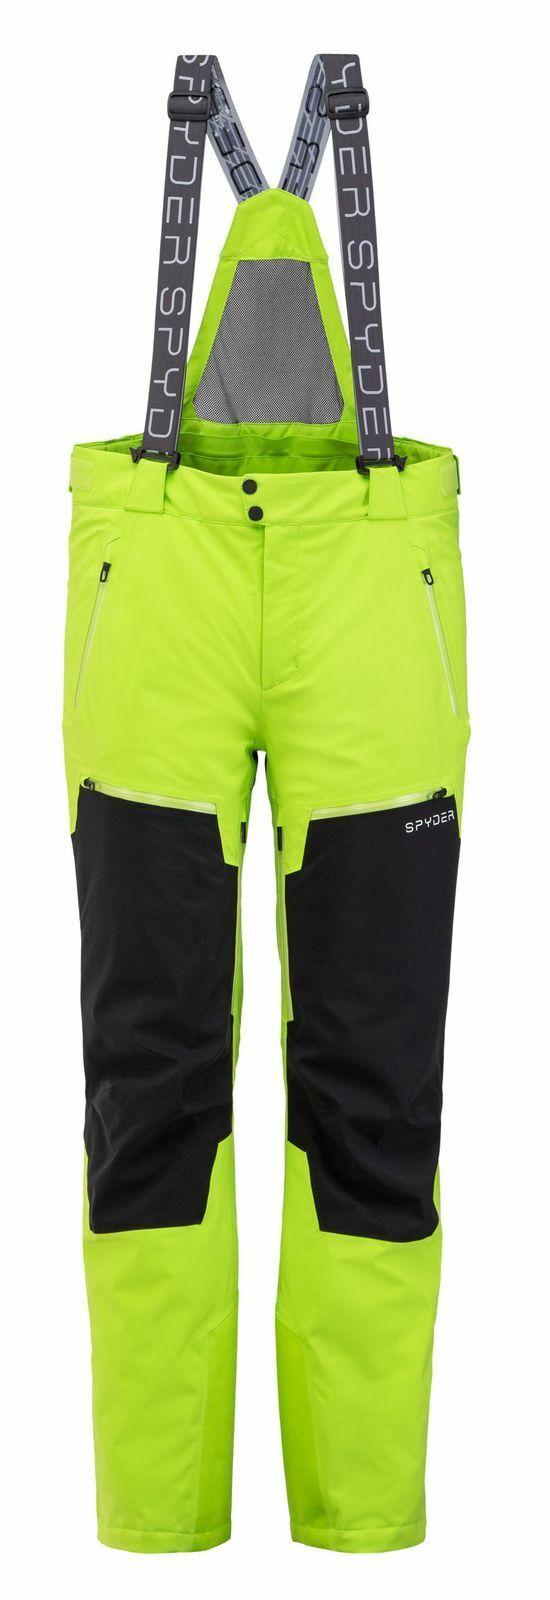 Spyder mannens goretex ski broek voortstuwing GTX primaire vulling, groen